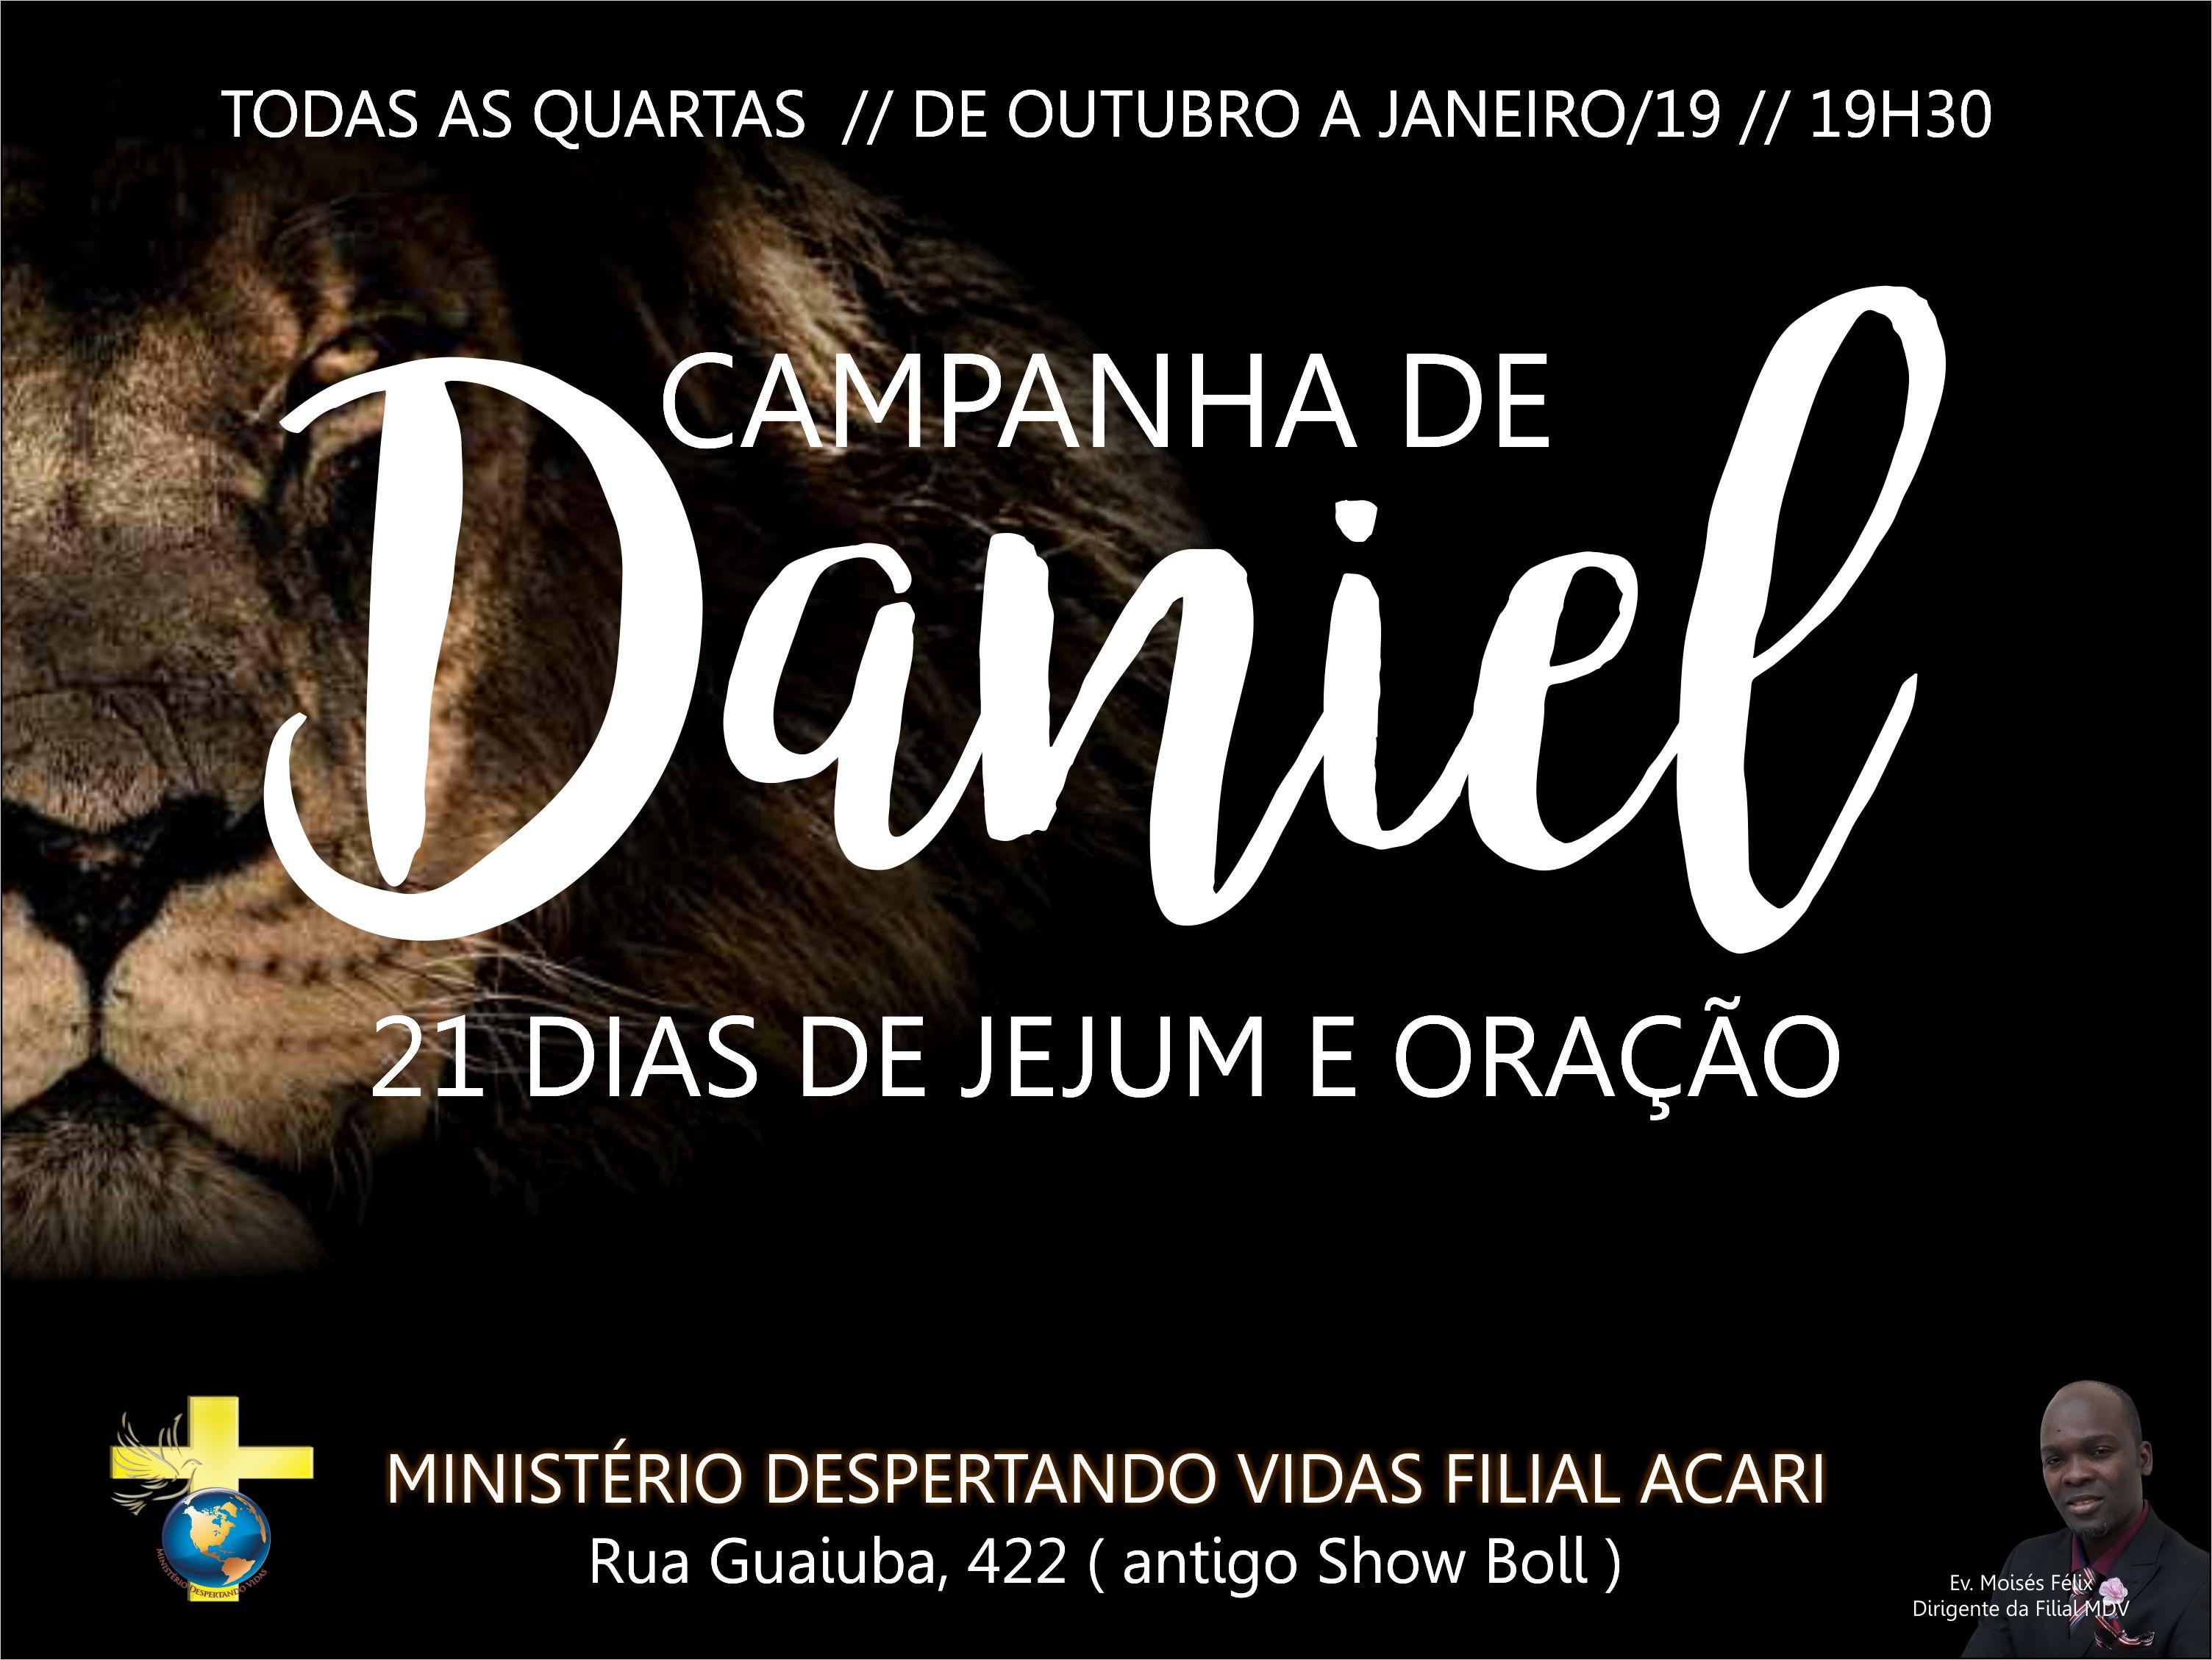 Campanha de Daniel